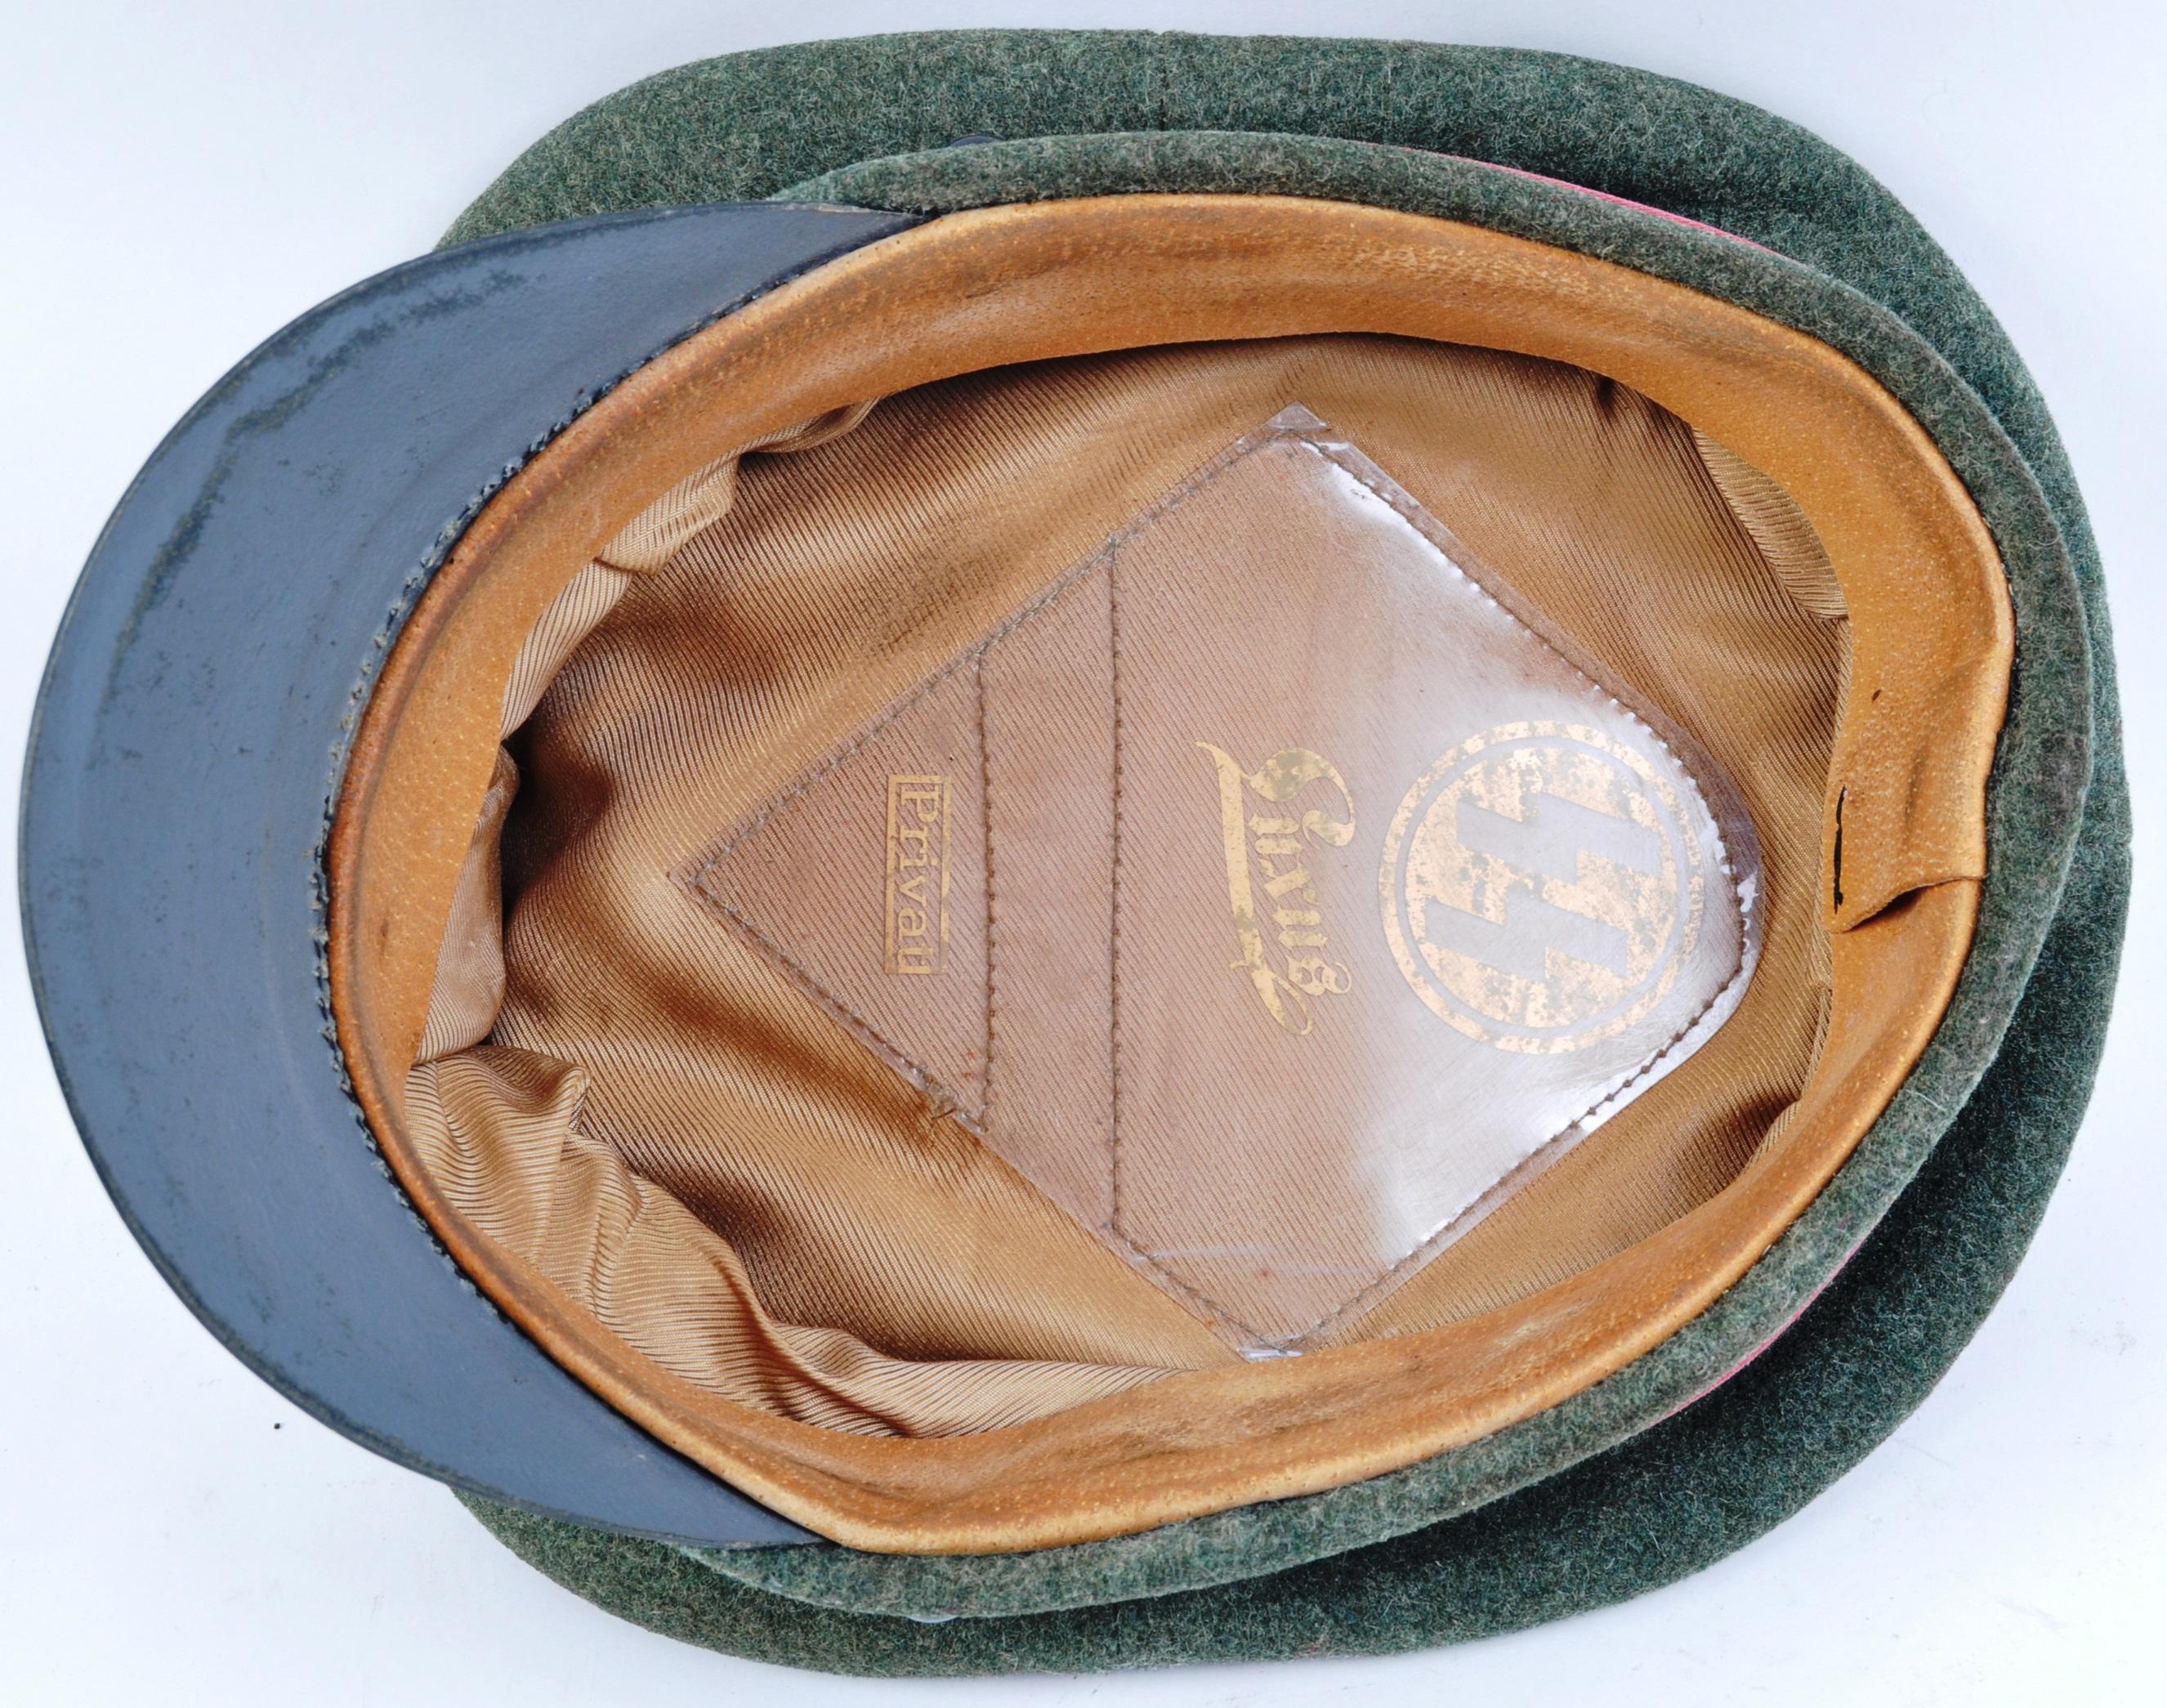 WWII SECOND WORLD WAR INTEREST - SS GERMAN PEAKED UNIFORM CAP - Image 4 of 5